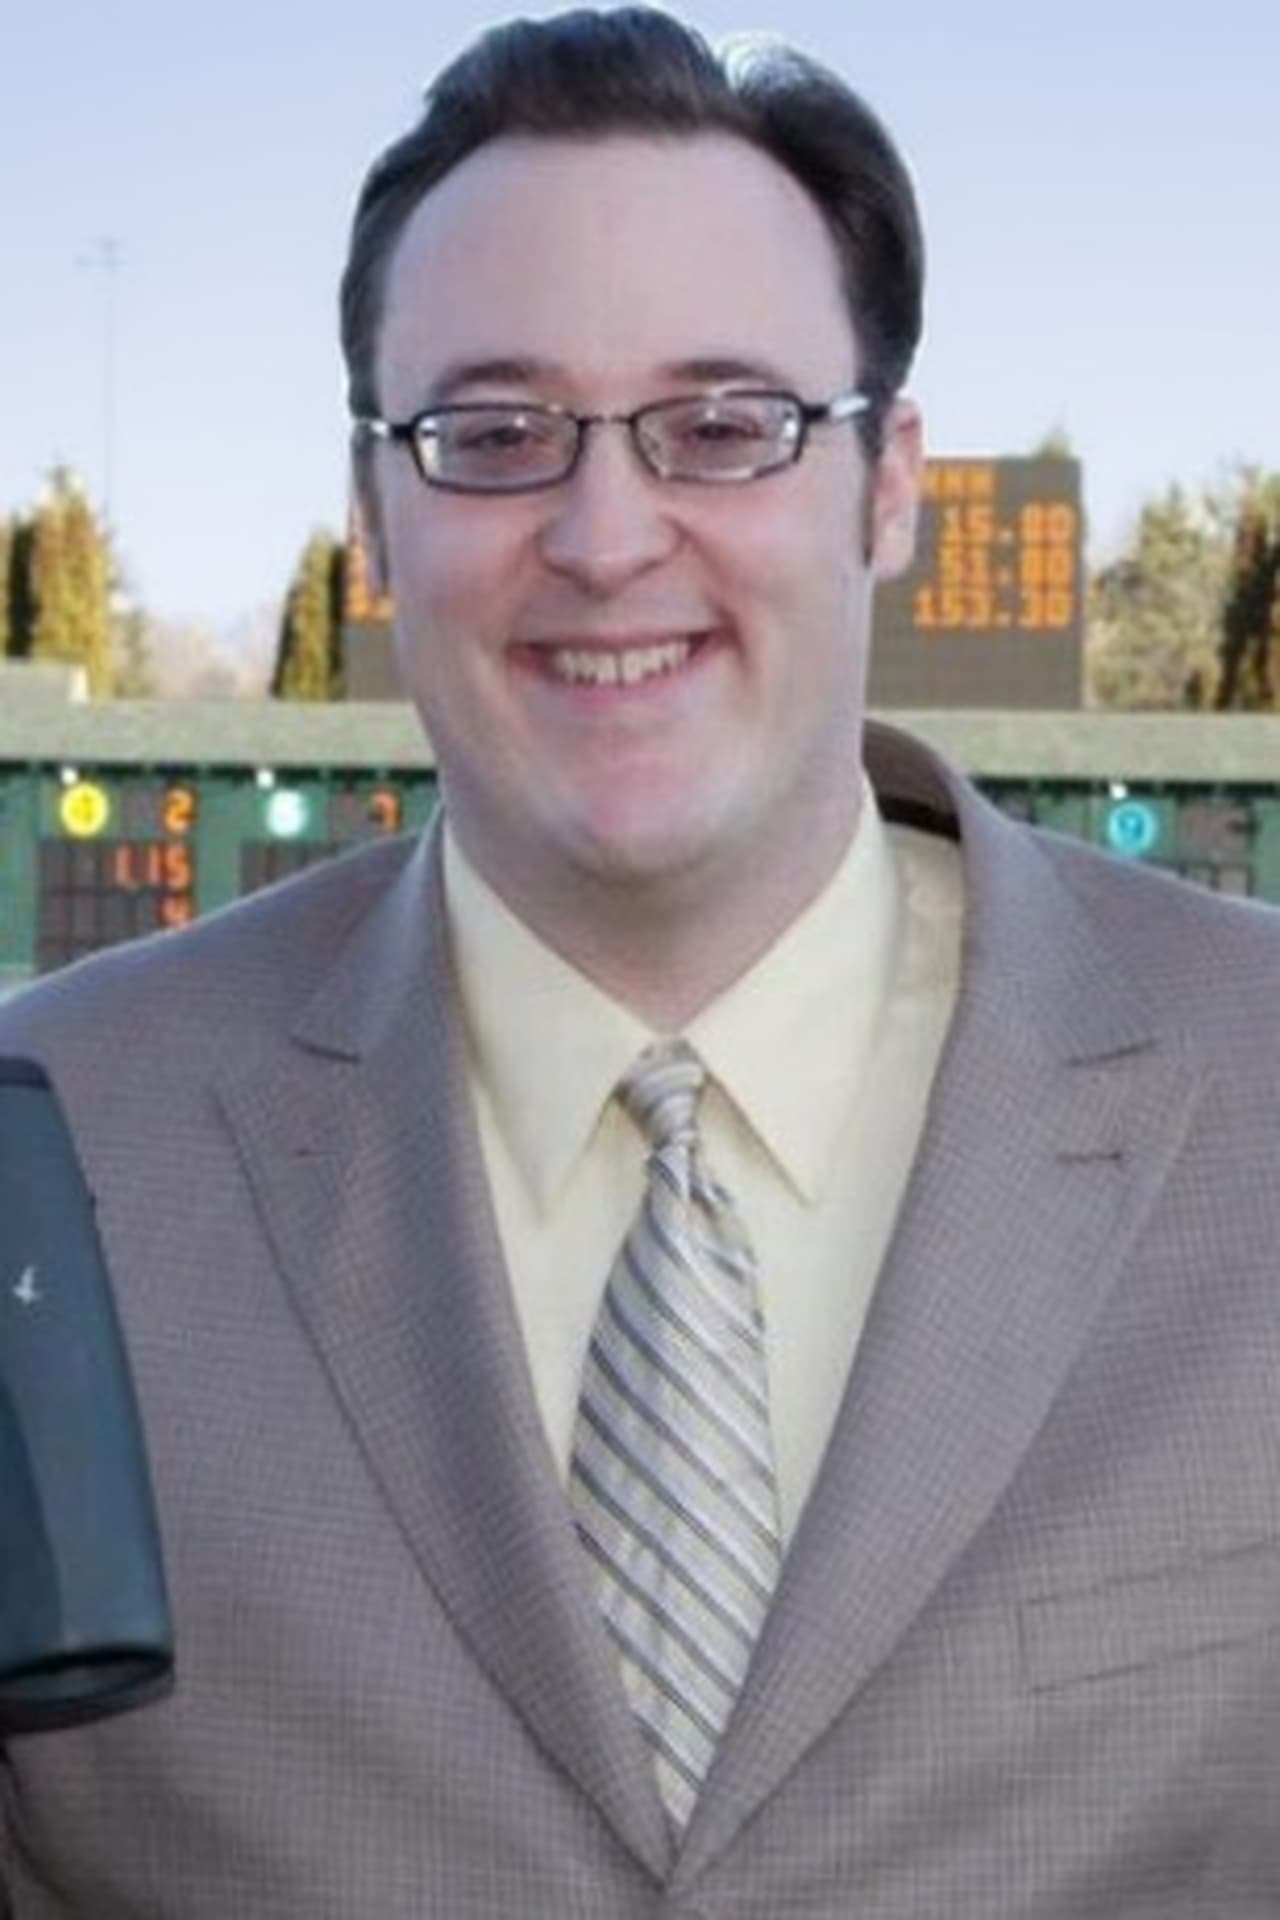 Jason Beem